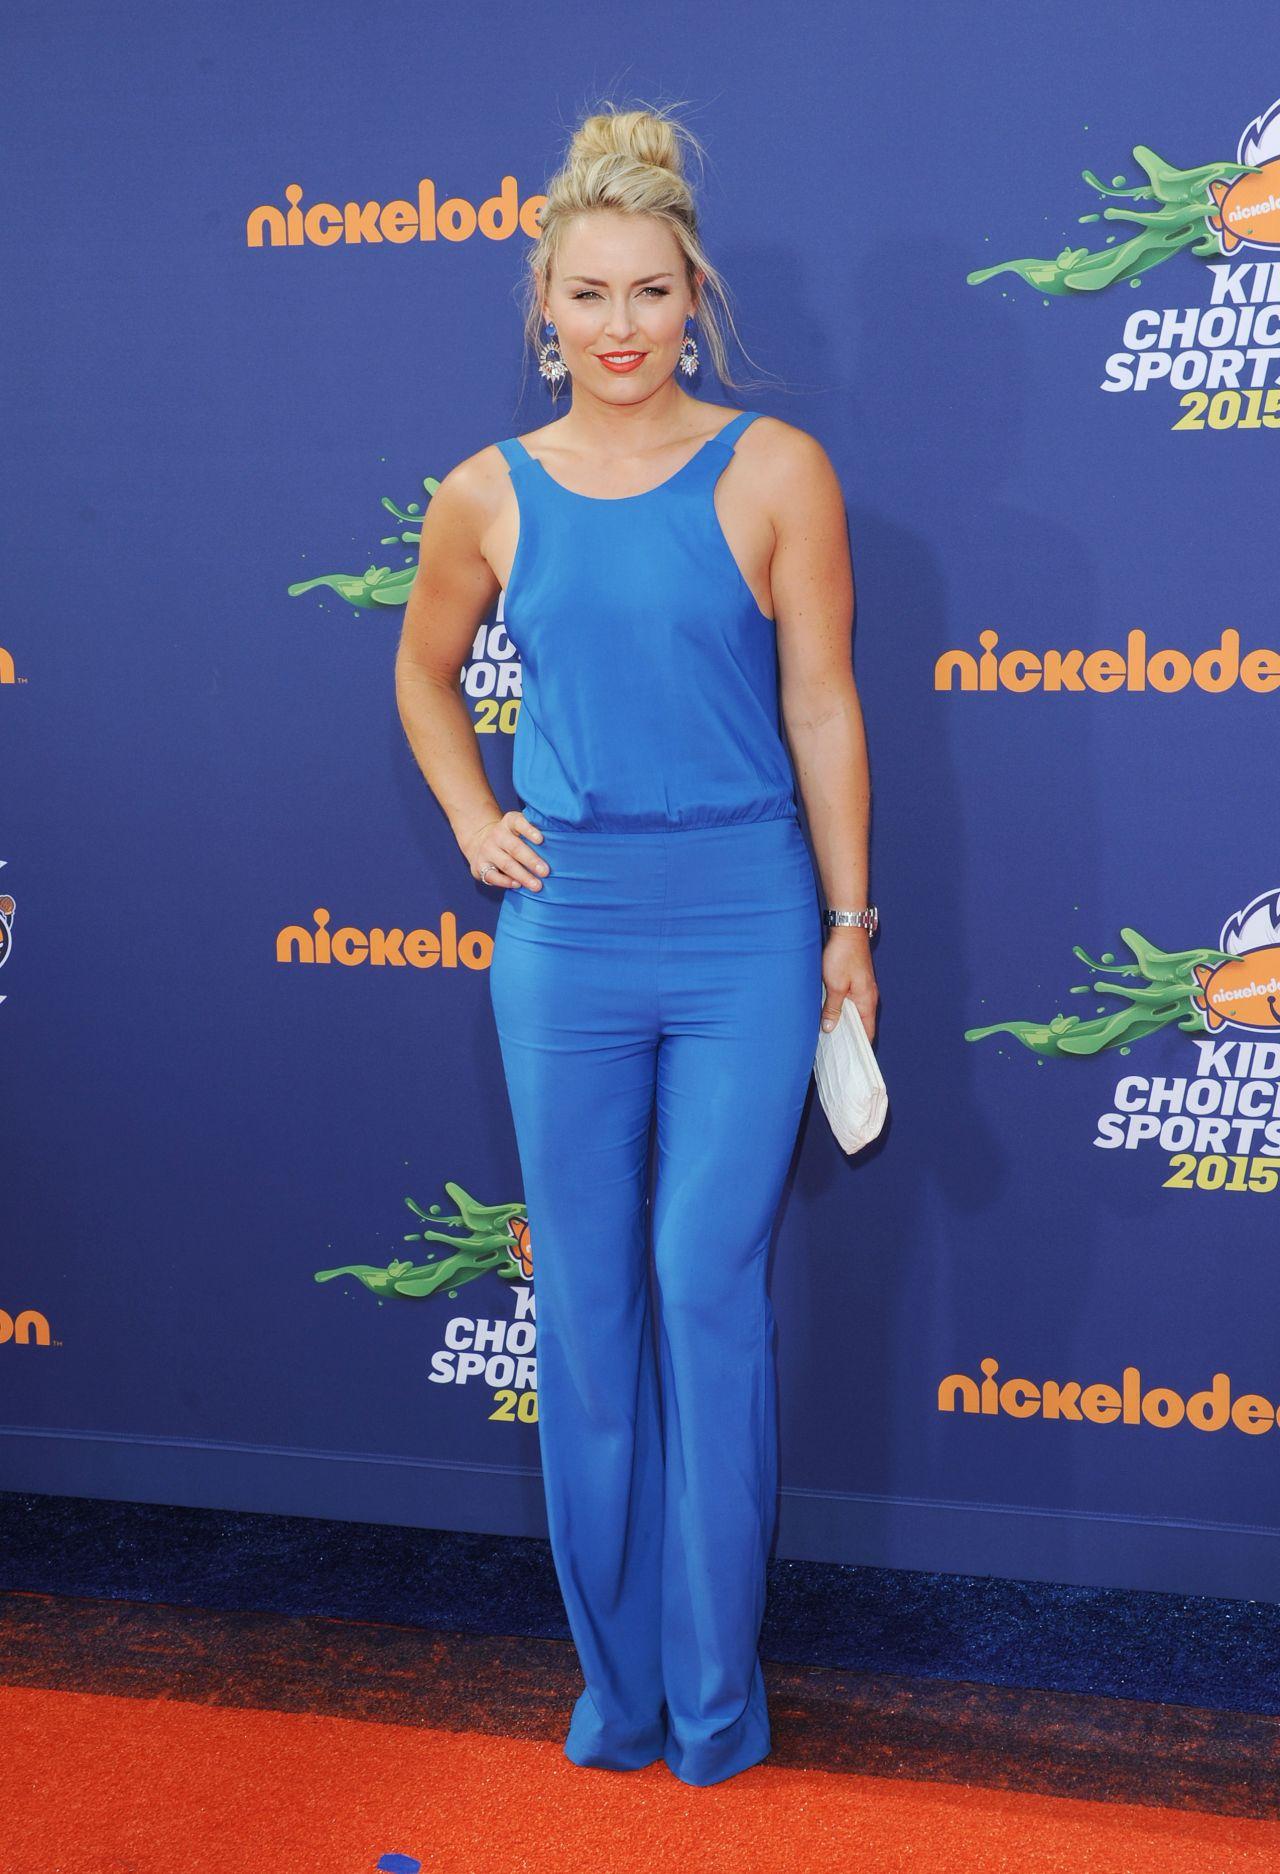 2015 Los Angeles Film Festival: 2015 Nickelodeon Kids' Choice Sports Awards